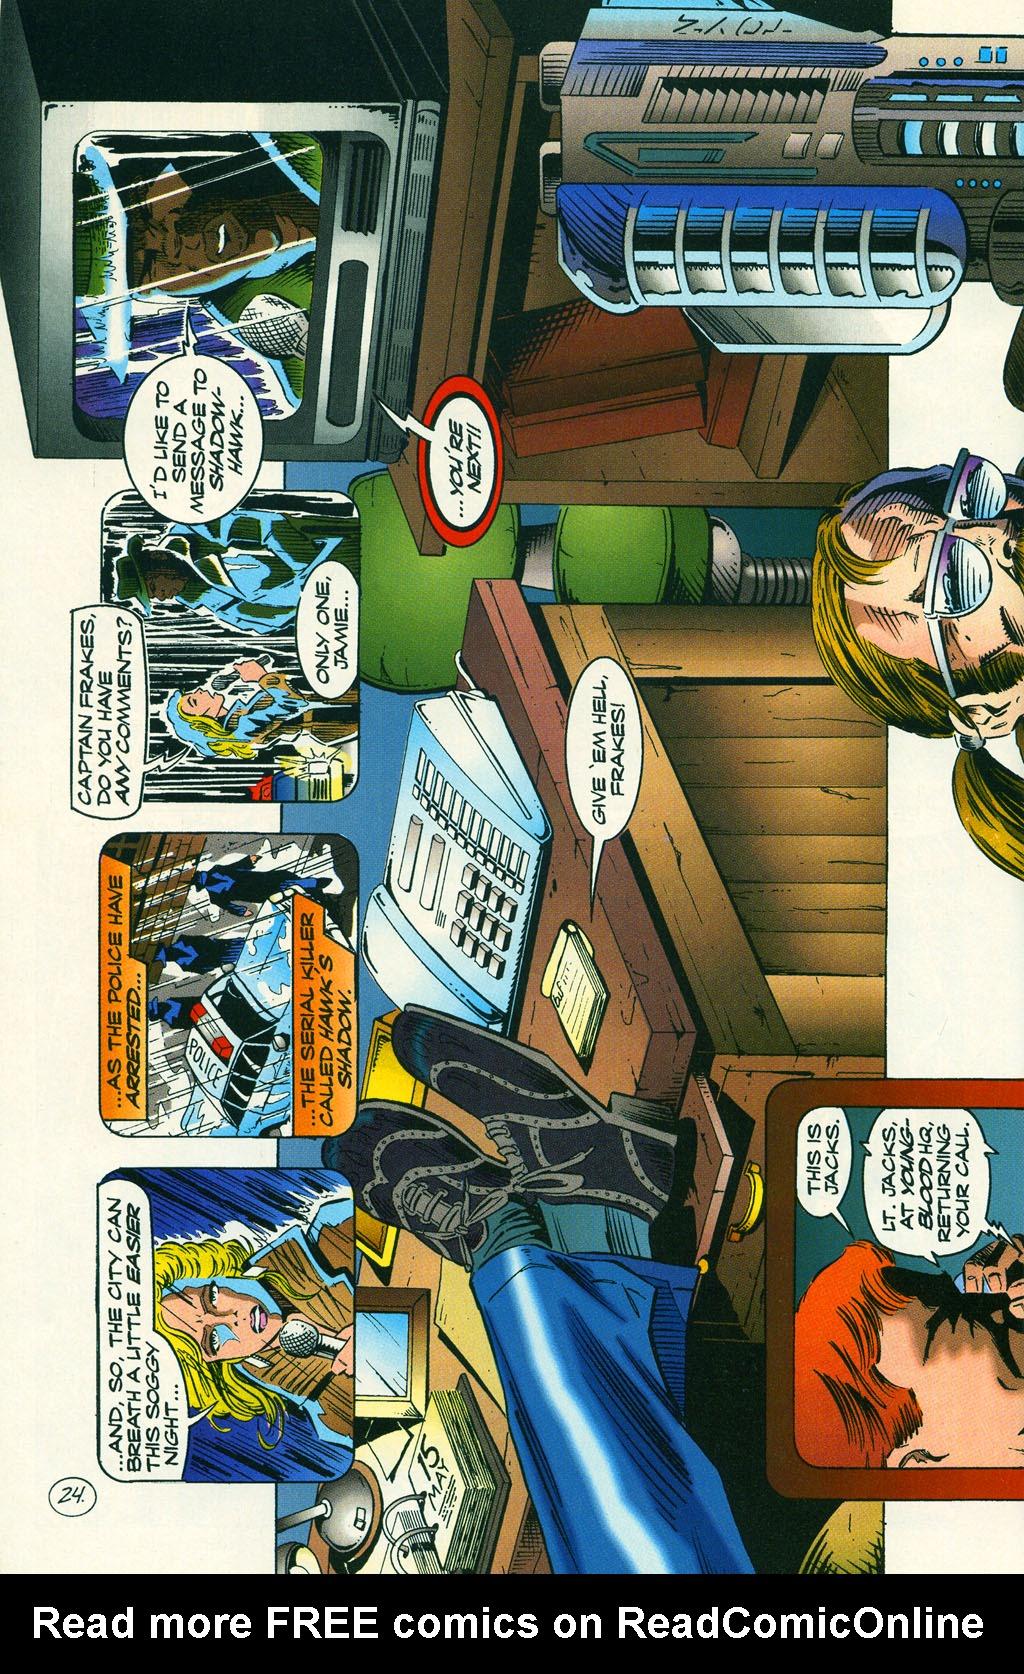 Read online ShadowHawk comic -  Issue #6 - 31